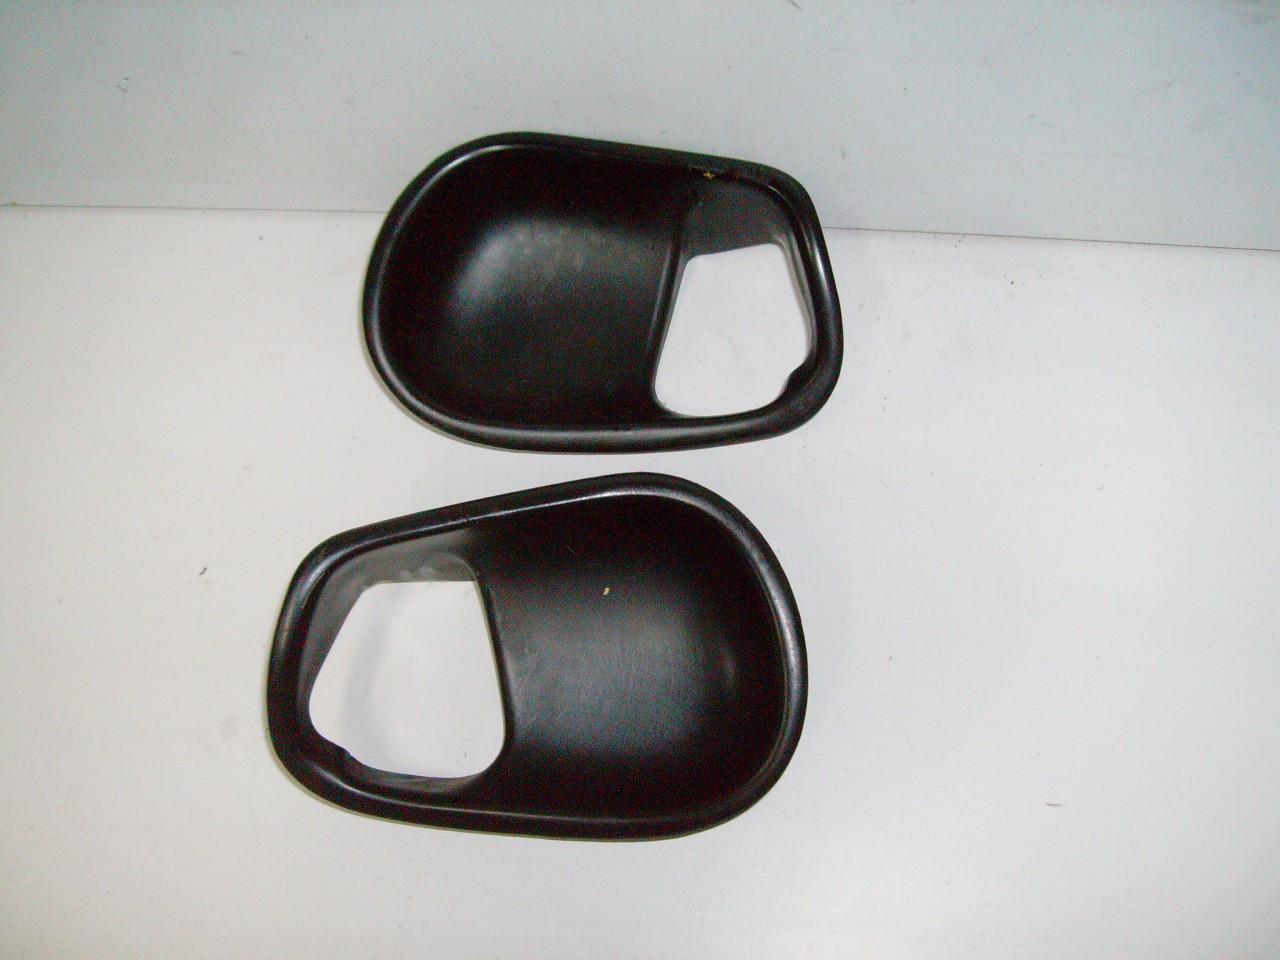 1994 2004 Ford Mustang Black Charcoal Door Panel Handle Interior Trim